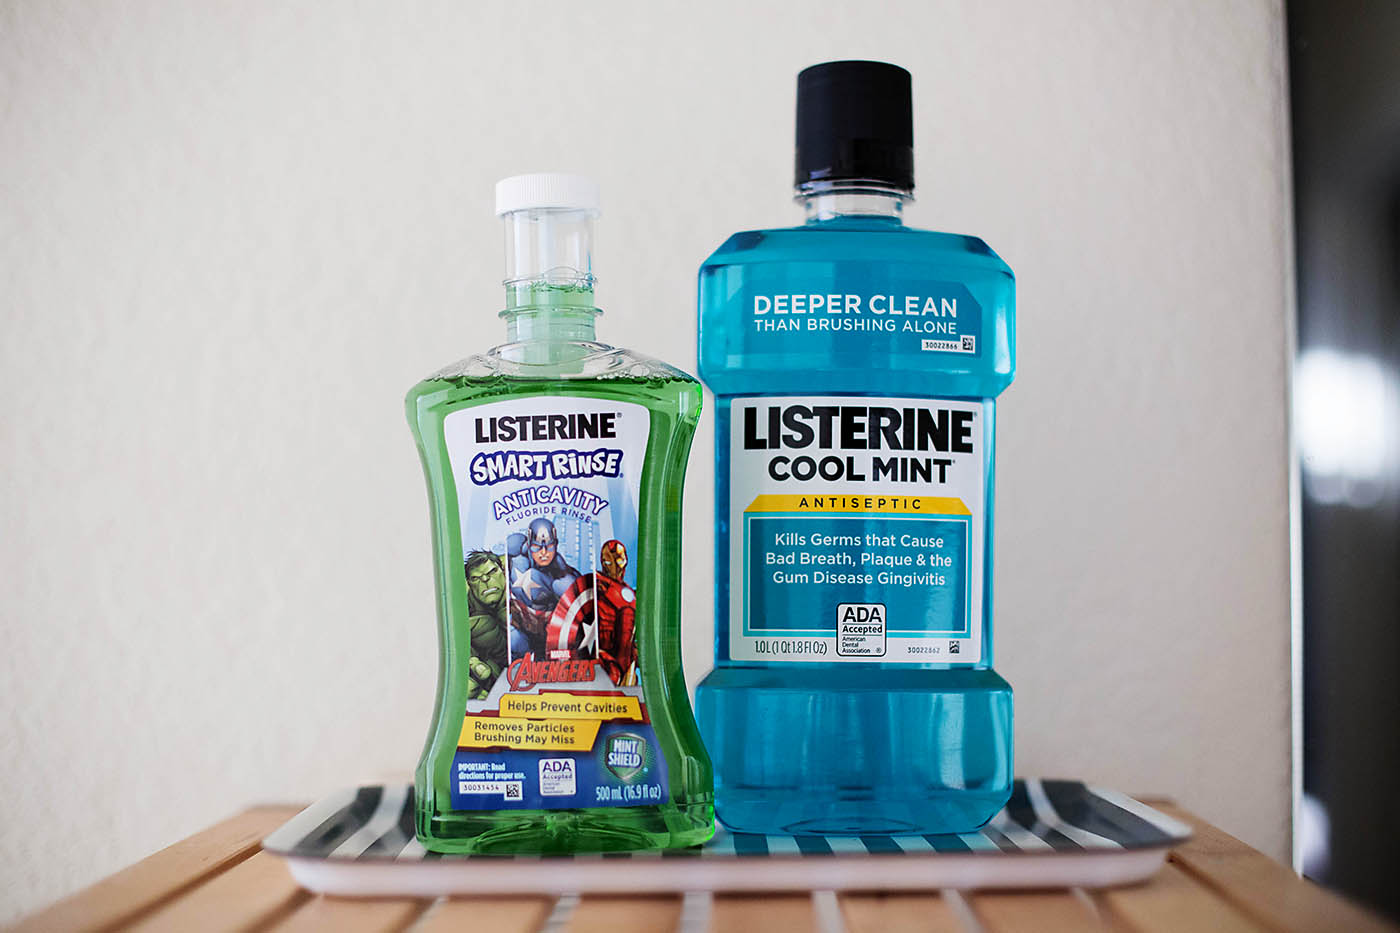 Listerine Bold Percent